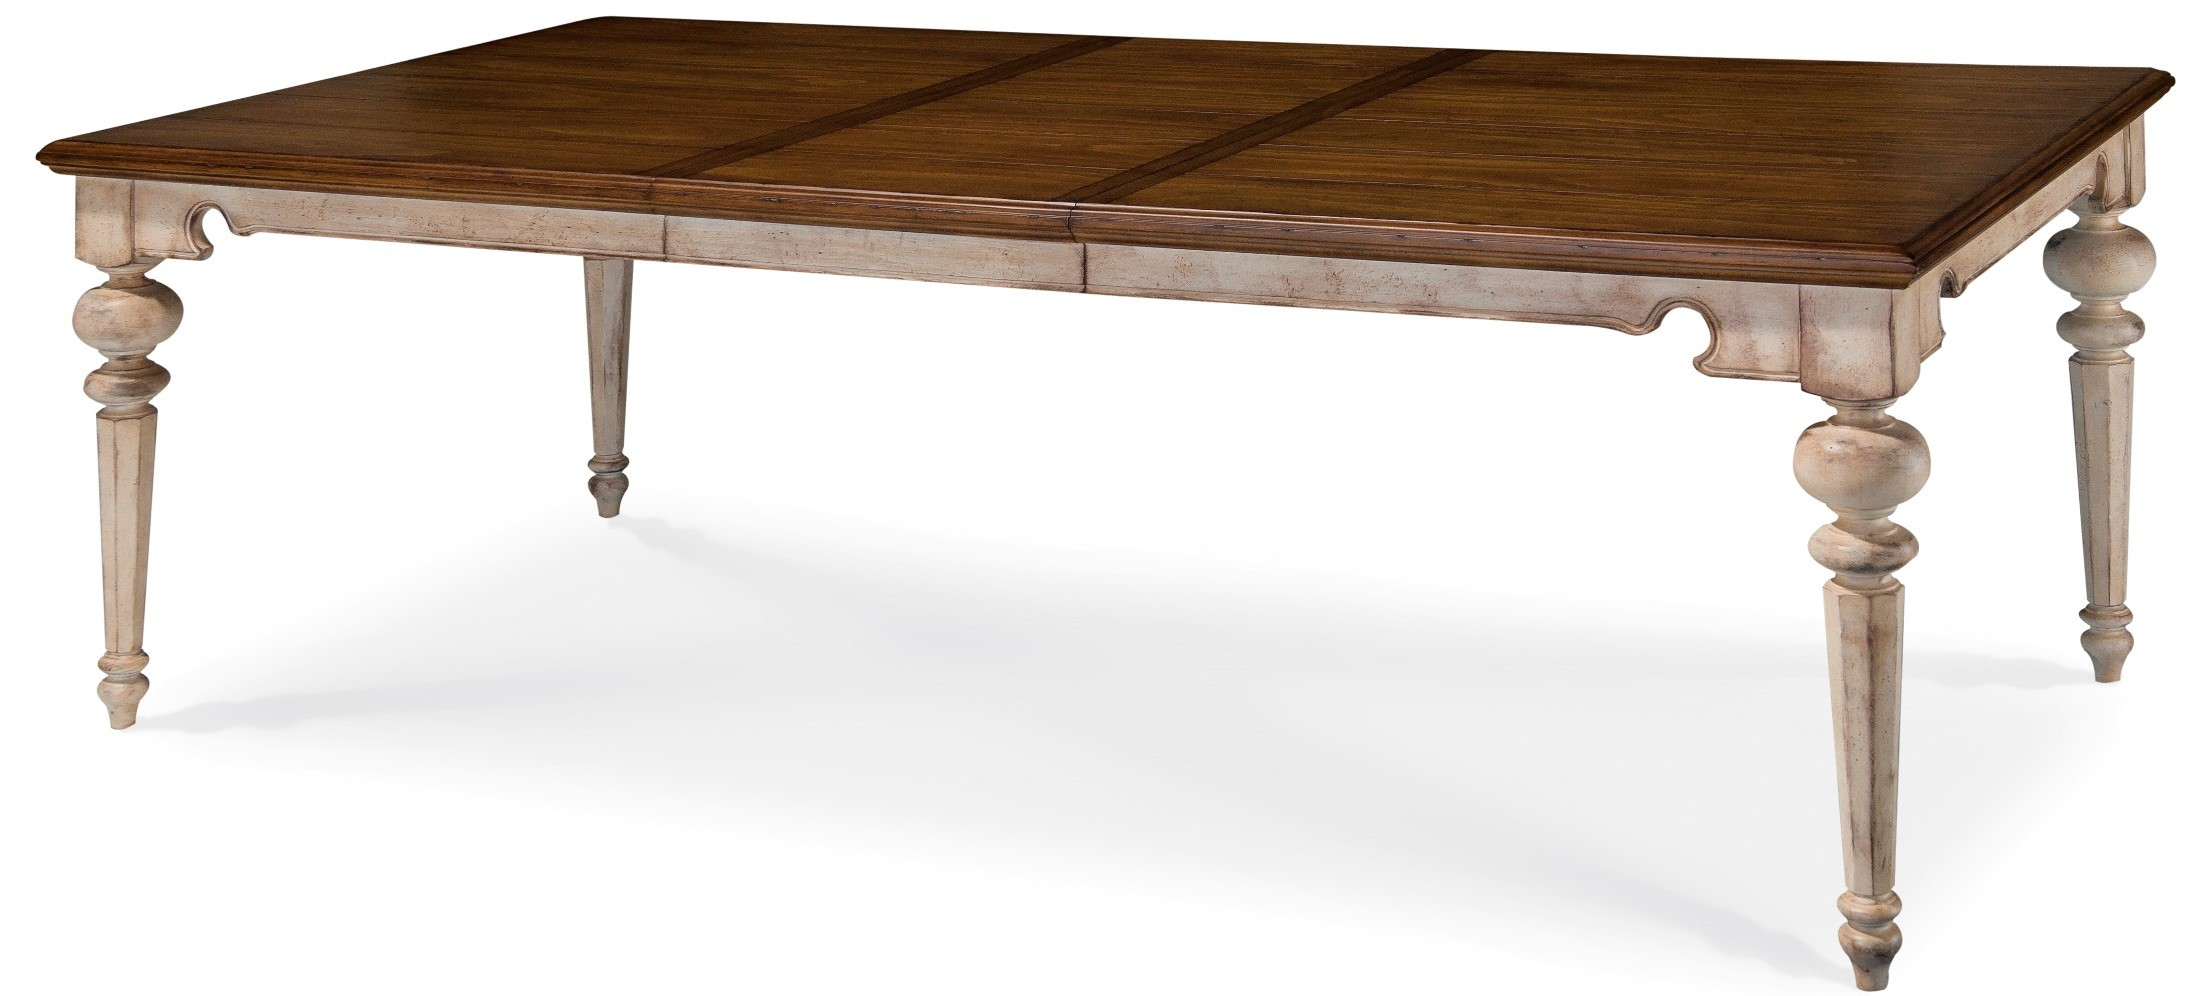 Belmar antique linen rectangular extendable dining table from art 189220 2617 coleman furniture - Rectangular dining table for 6 ...